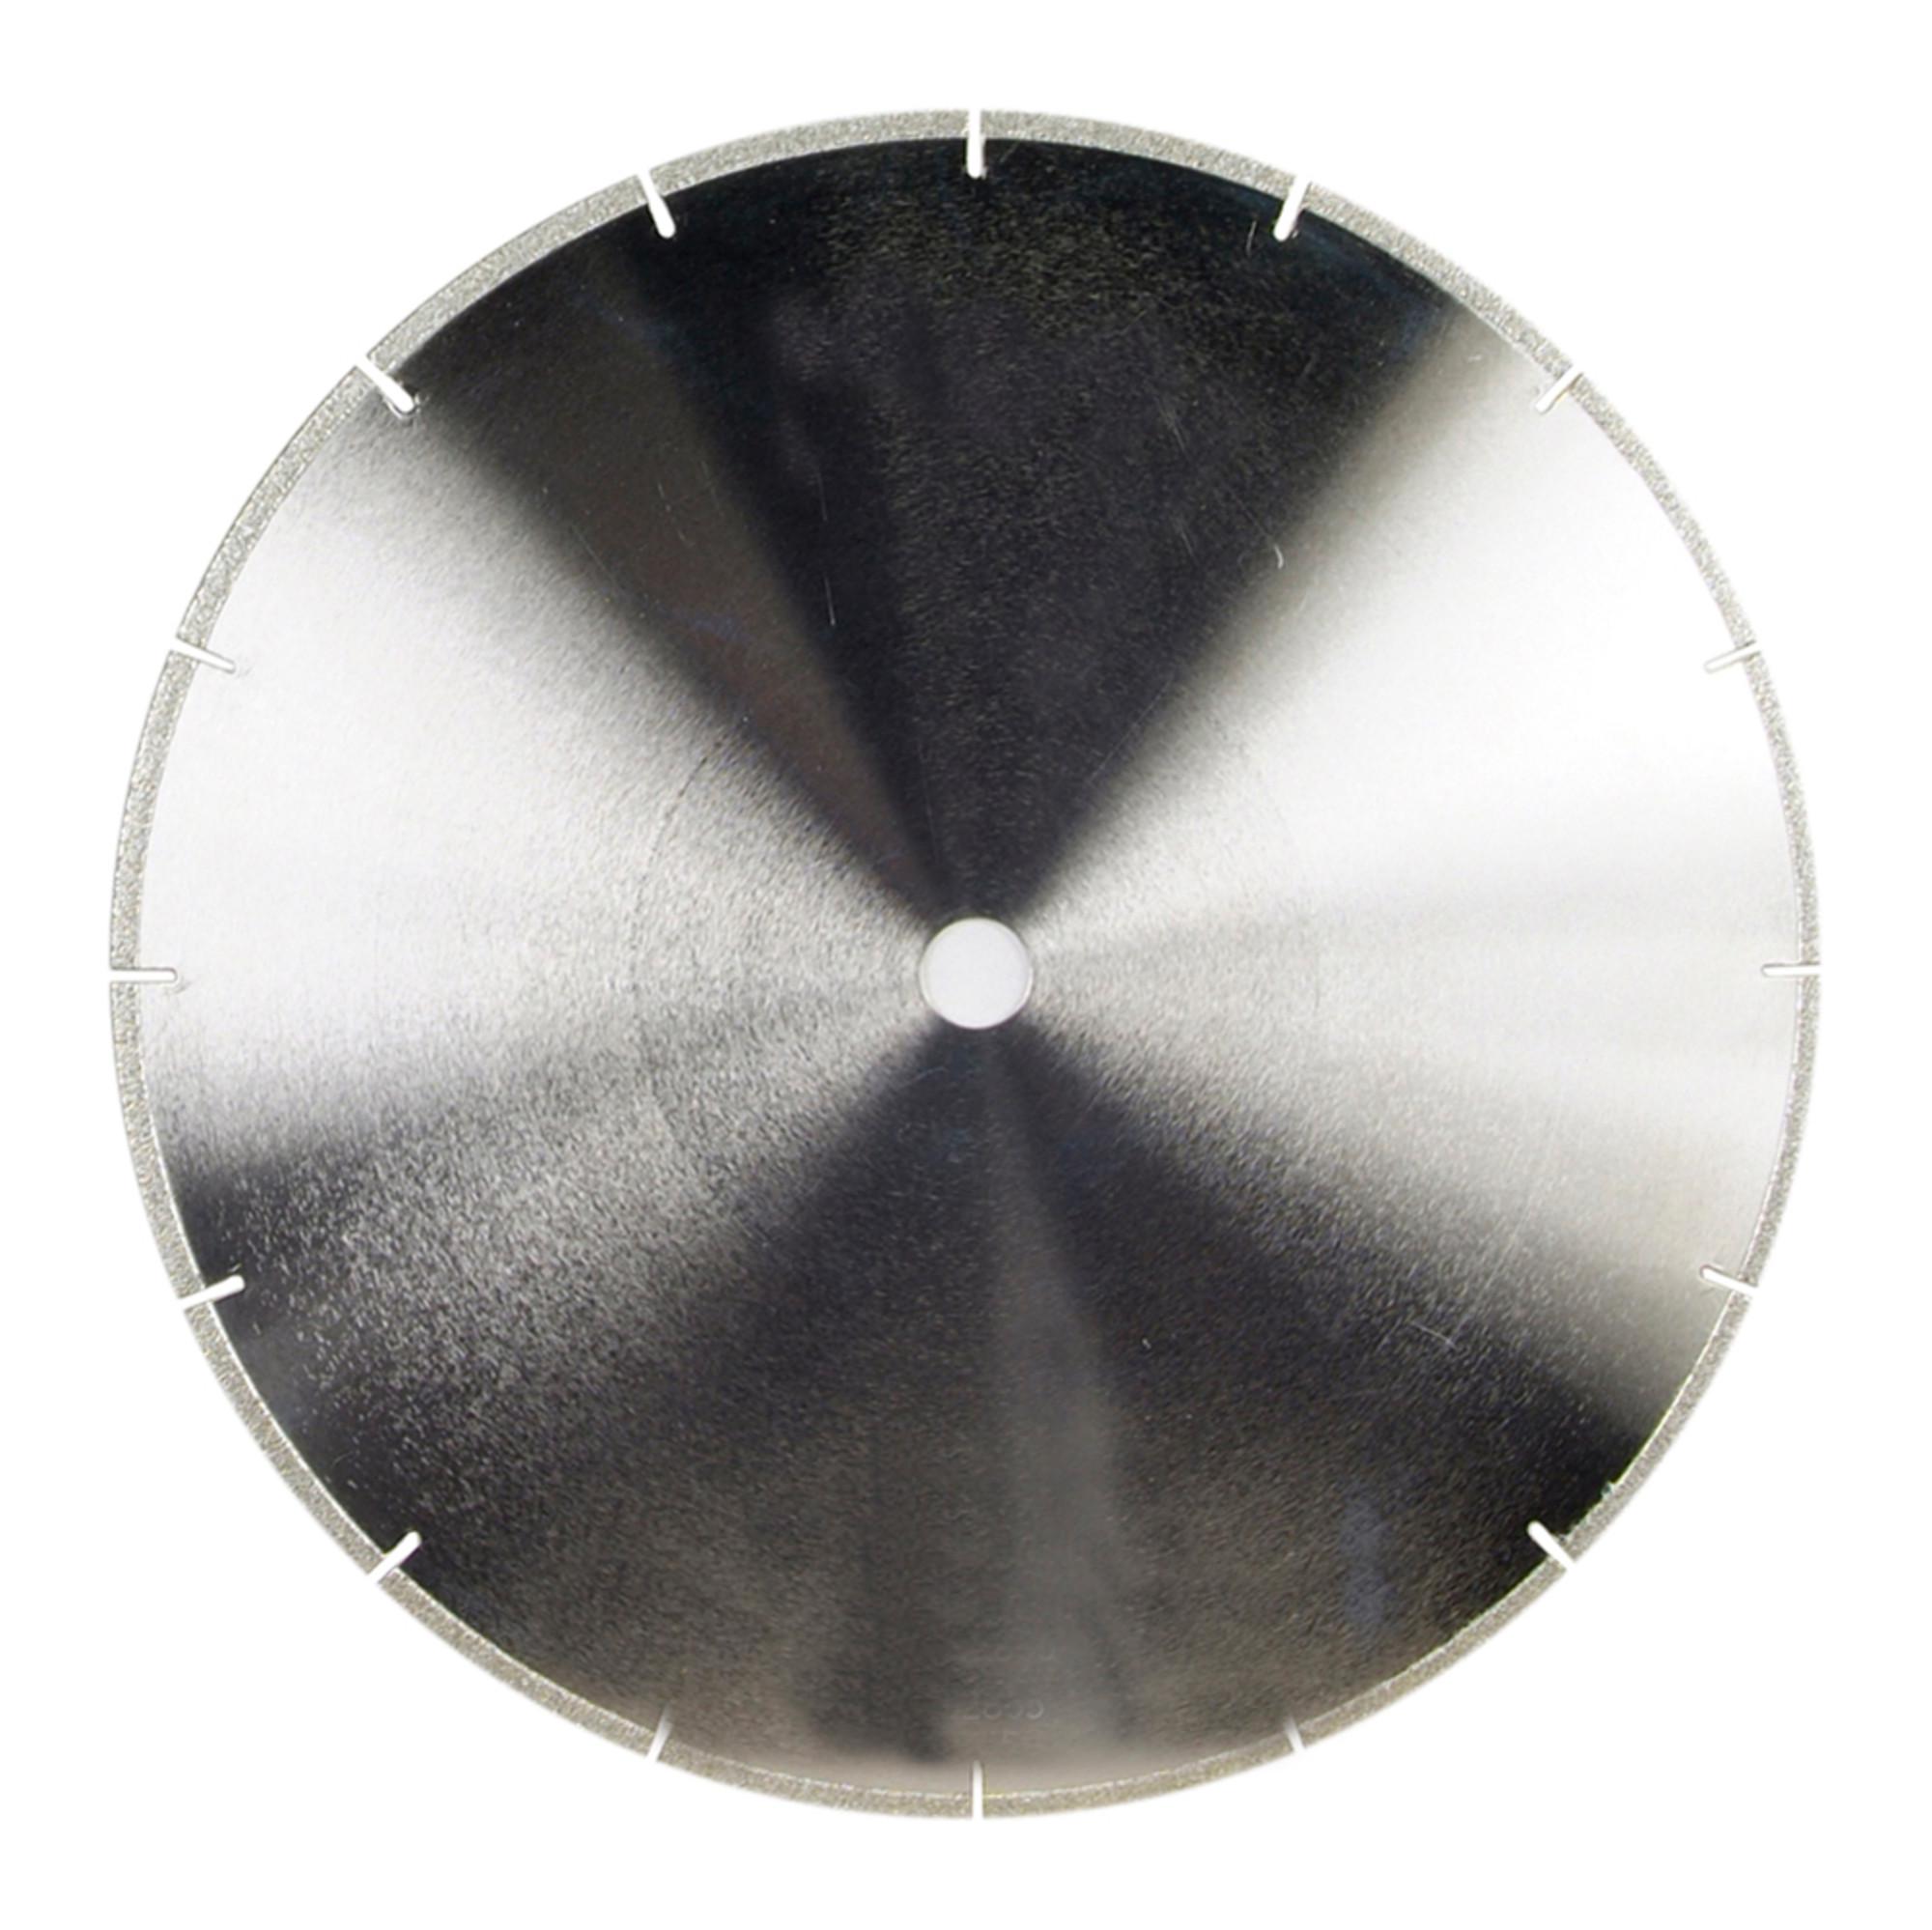 3M™ 051111-54587 6002J Lapping Film Sheet, 5 in L x 2-1/4 in W, M74 Grit, Diamond Abrasive, Red